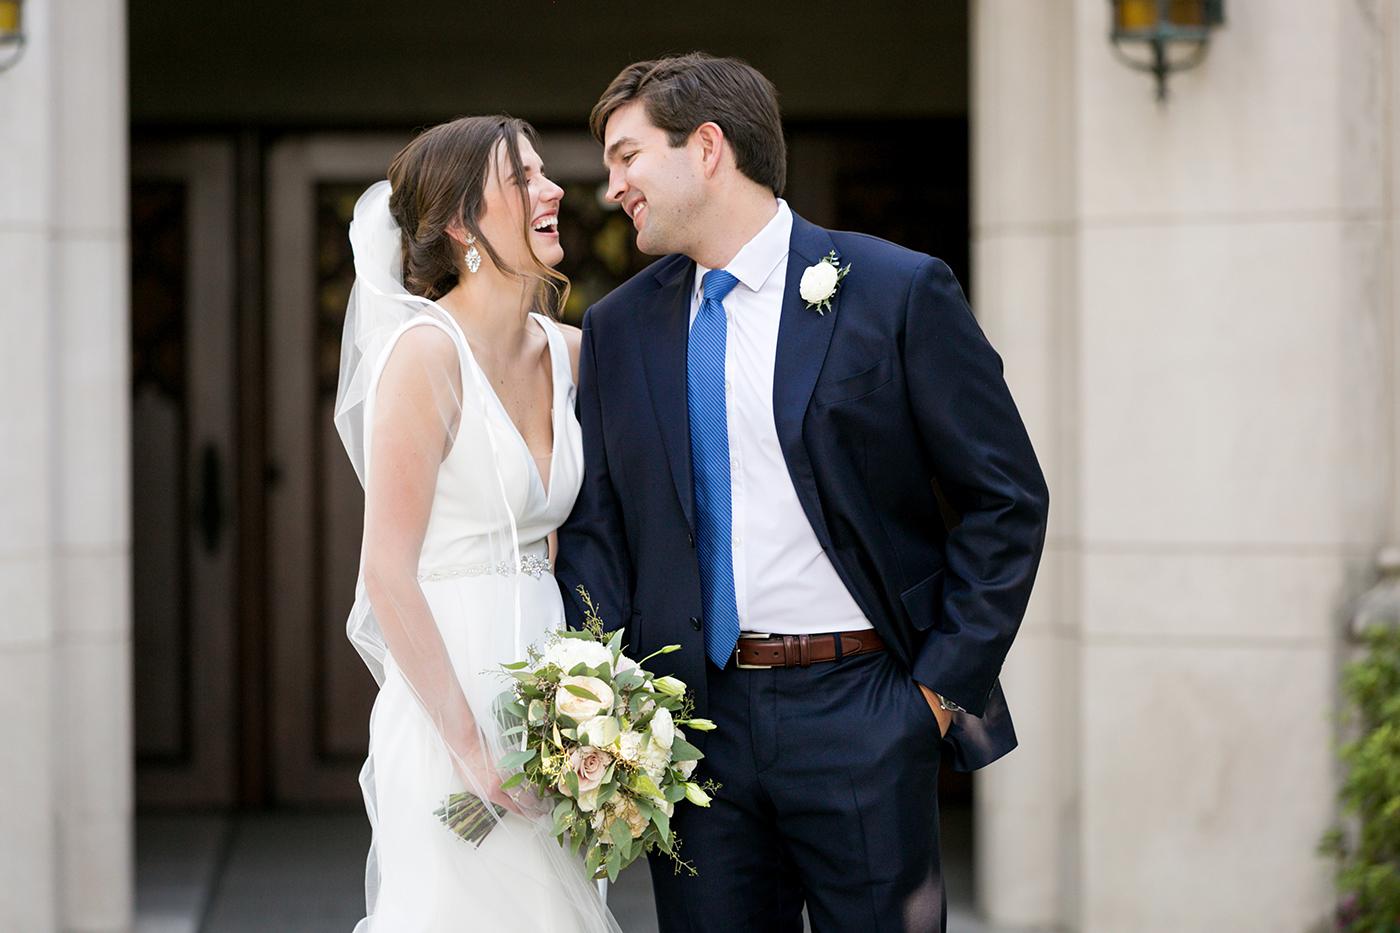 Wedding Planner Dallas TX - Allday Events - Highland Park - Marie Gabrielle Wedding - 259.jpg